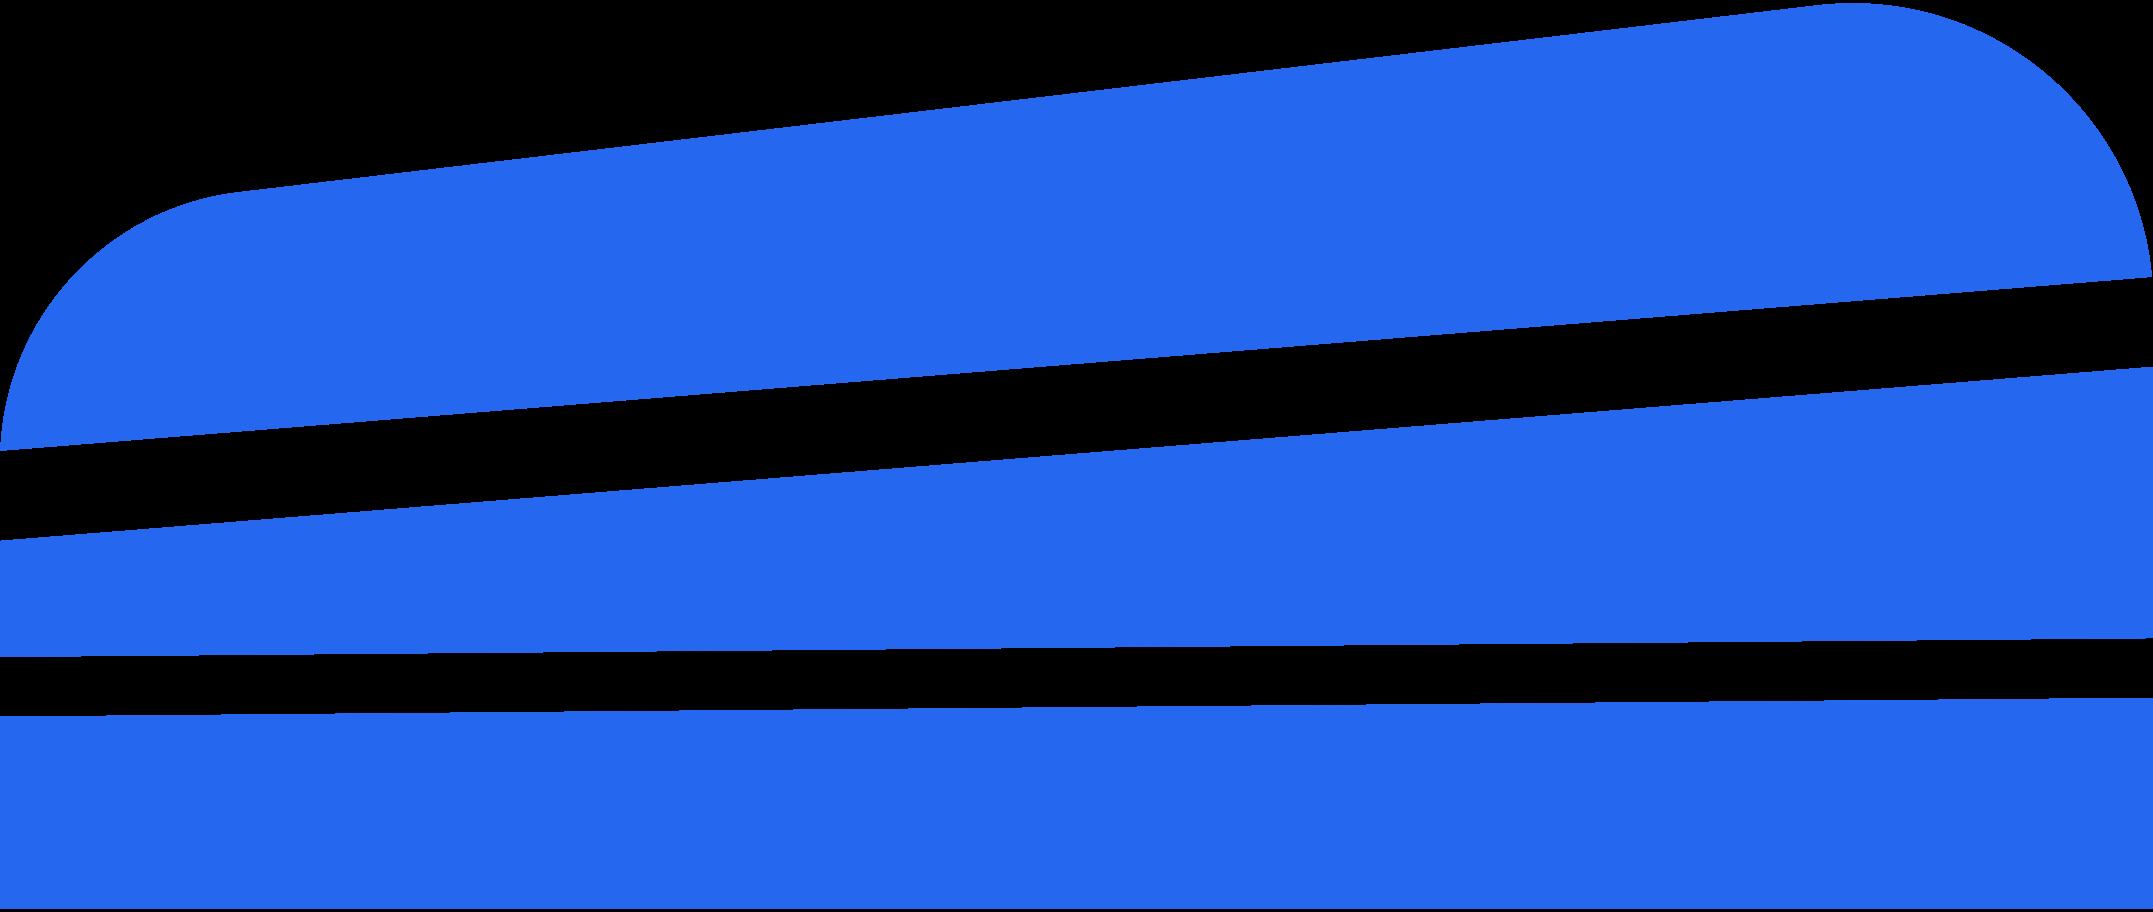 stack of paper Clipart illustration in PNG, SVG